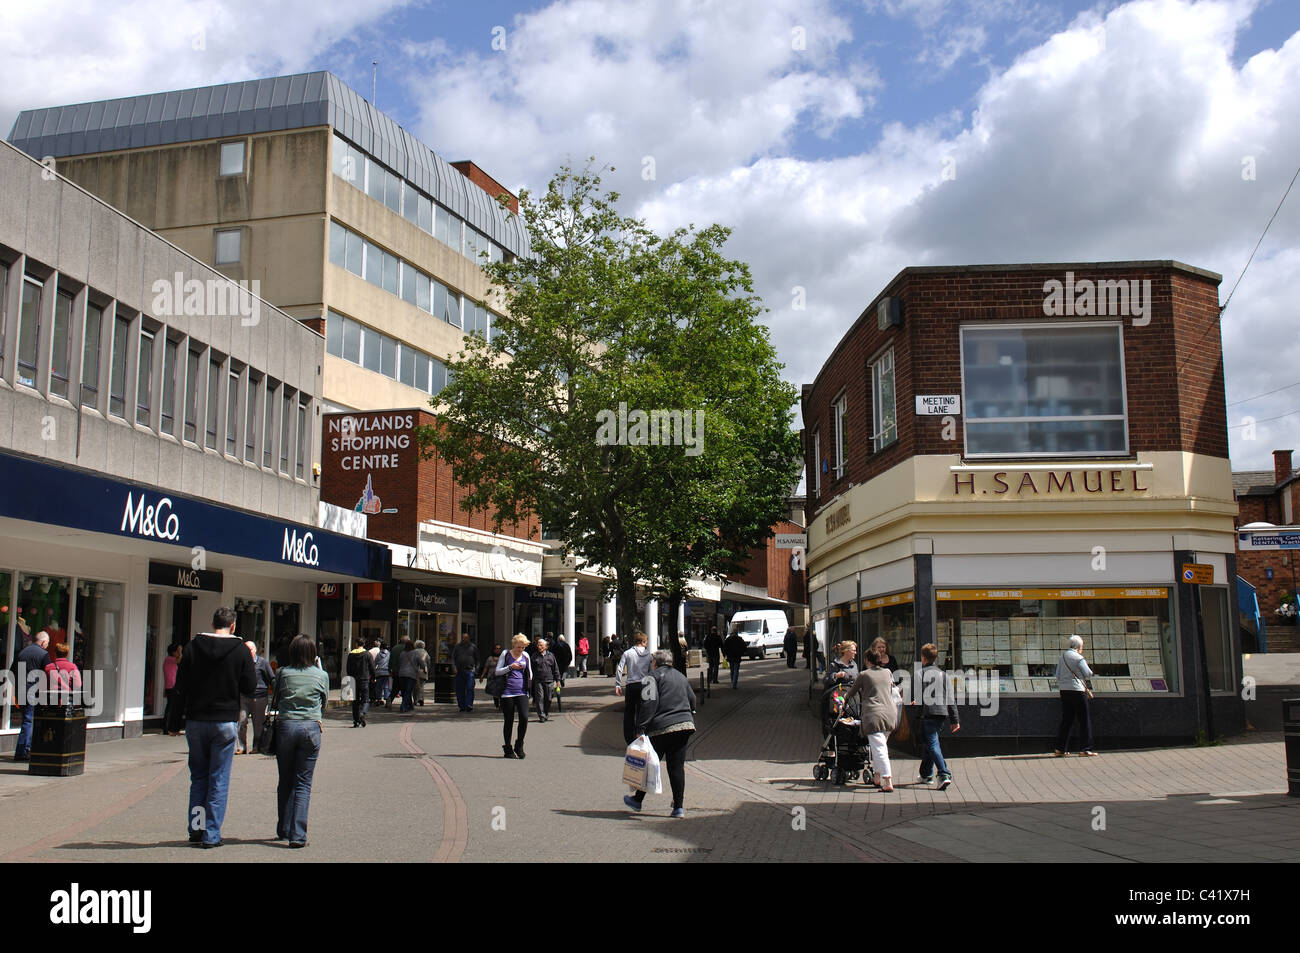 shops kettering northamptonshire stock photos & shops kettering